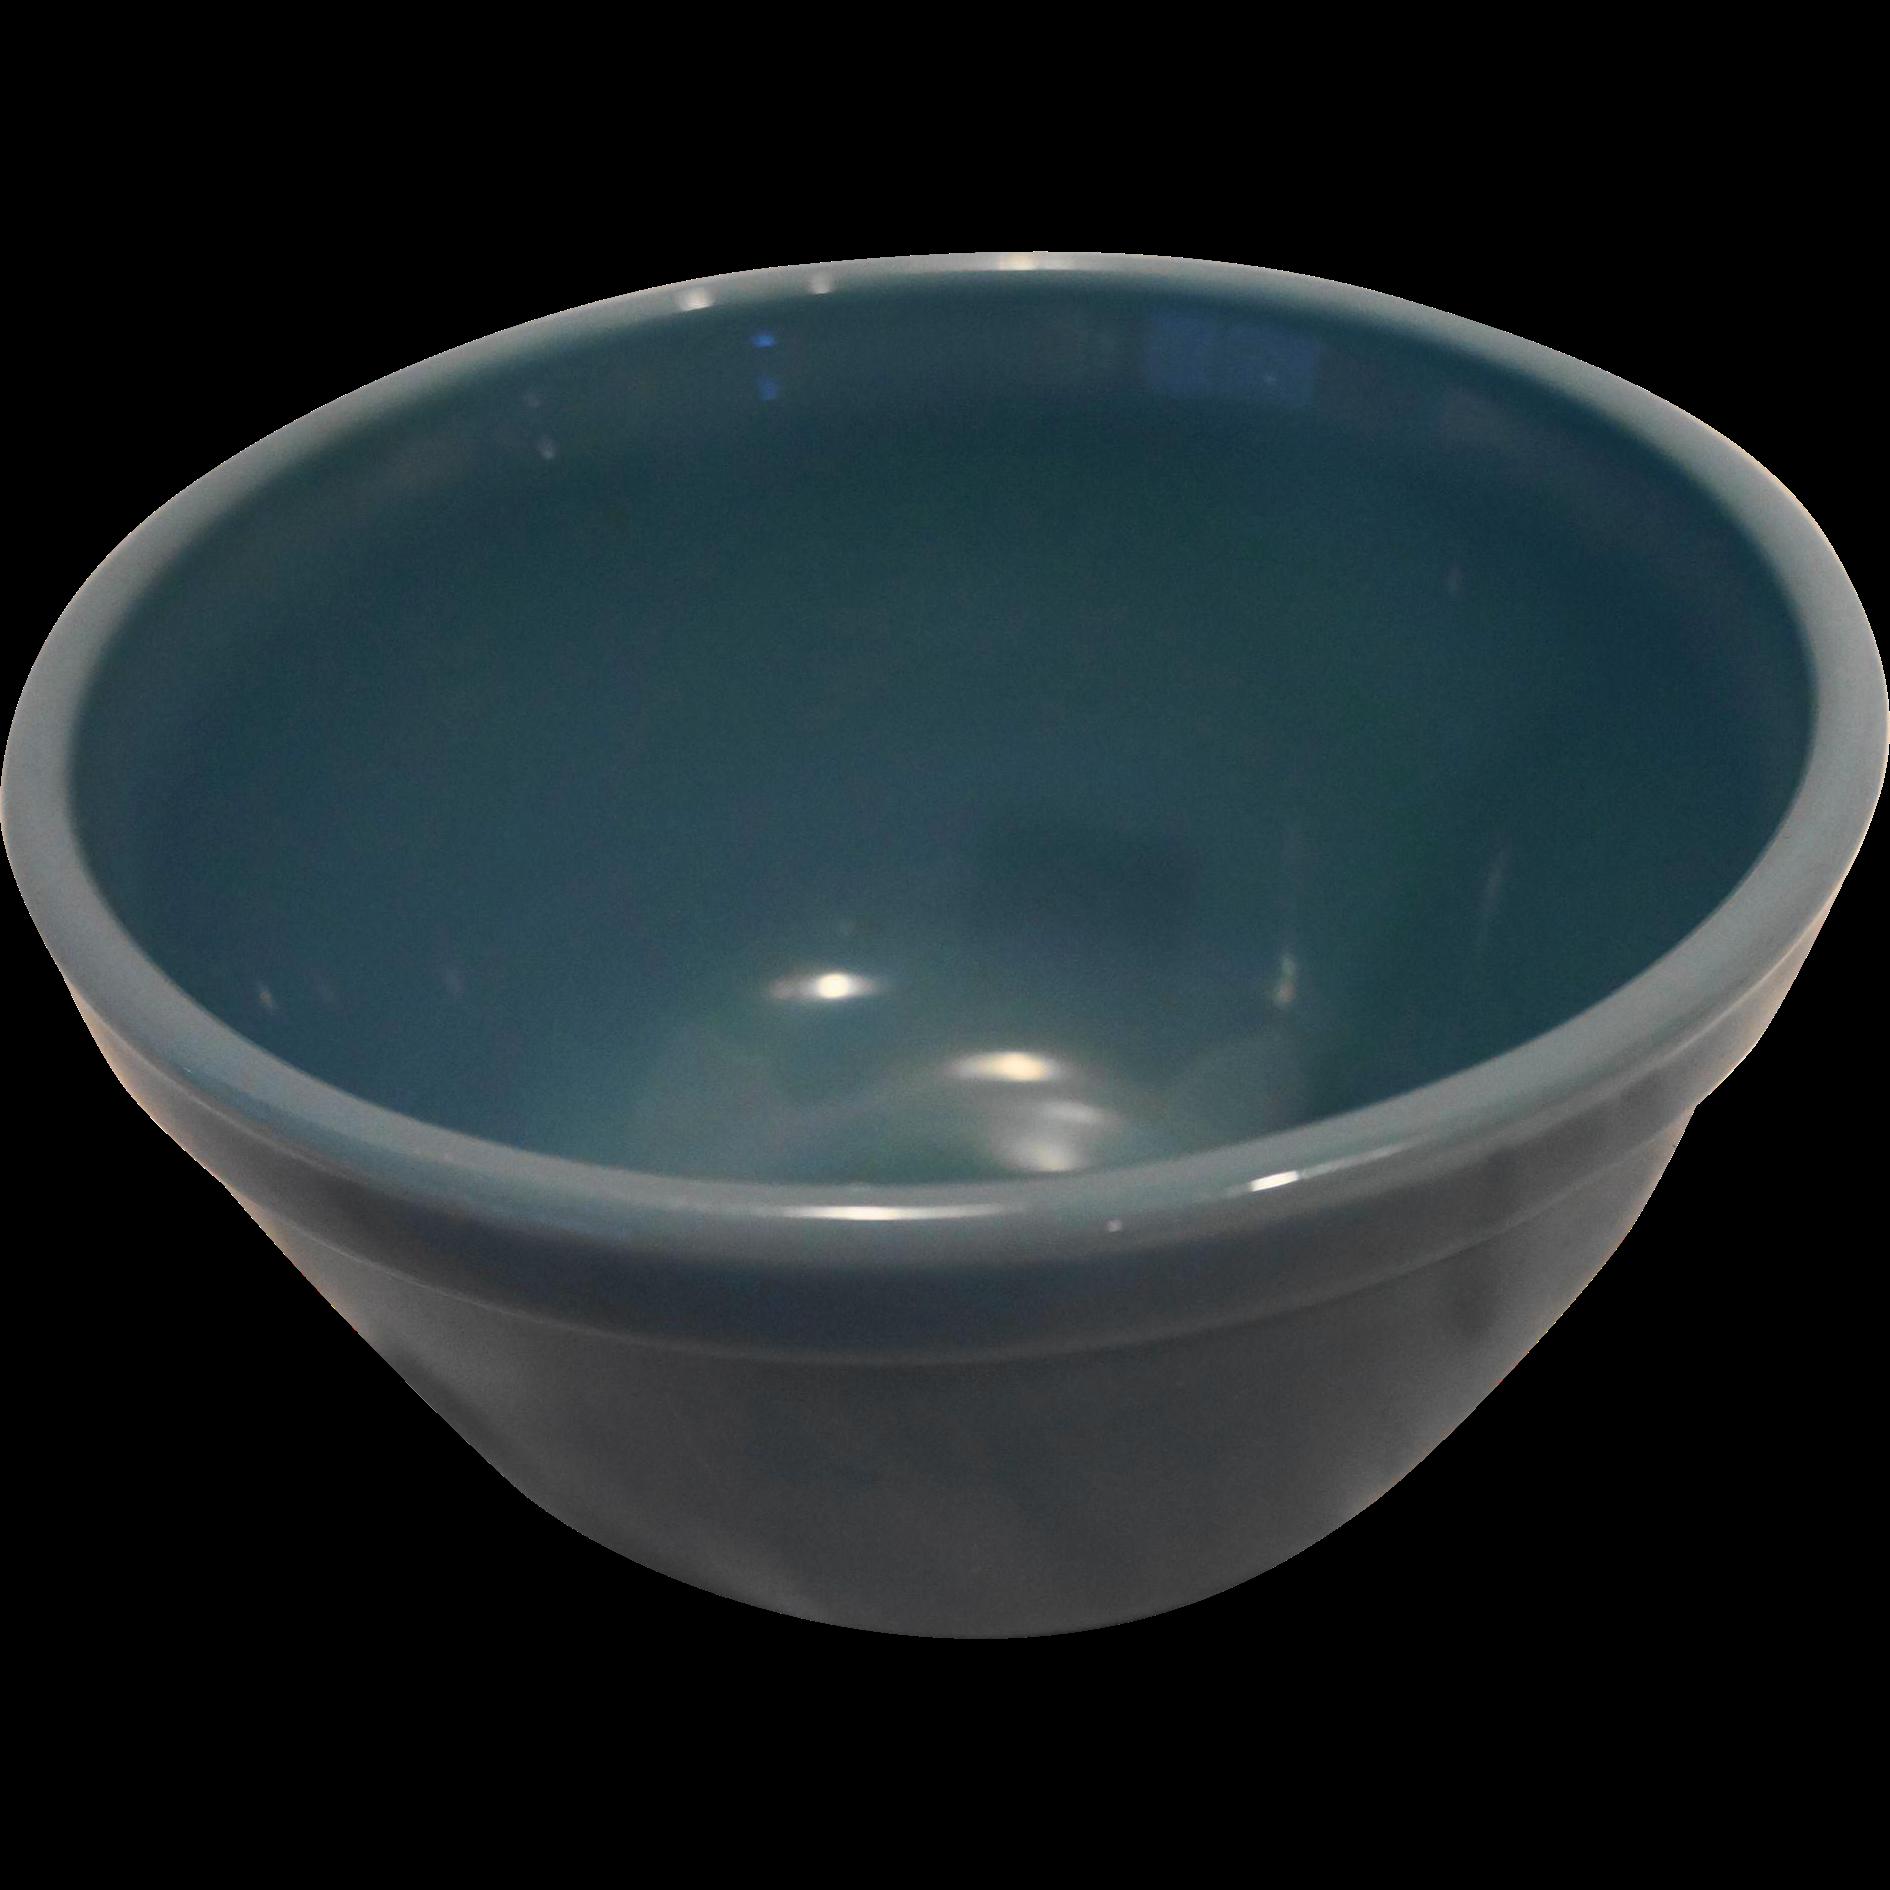 Pyrex Delphite Blue Bluebelle 401 1 1/2 Pint Small Bowl